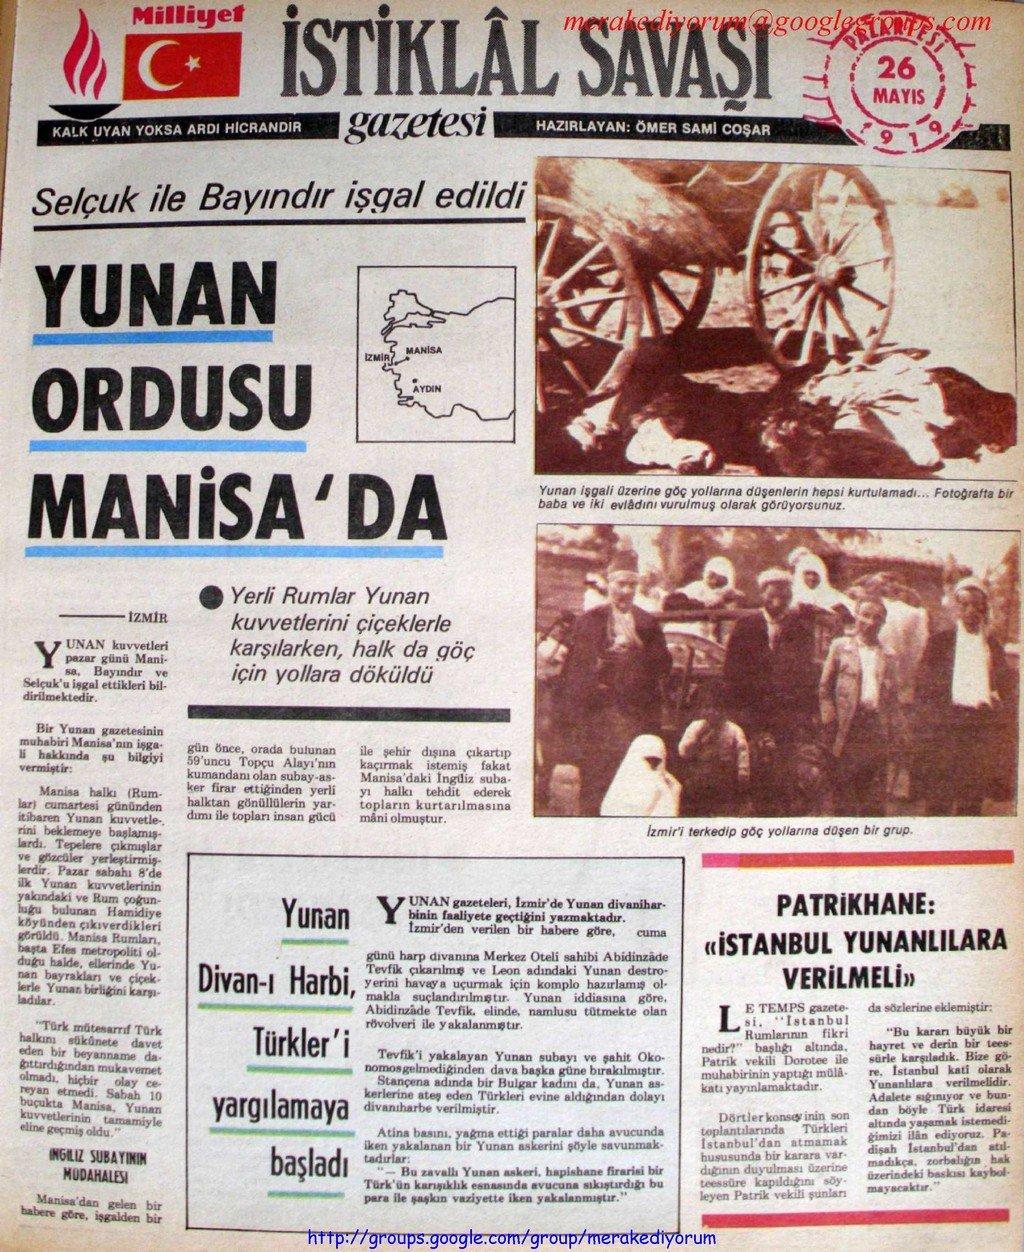 istiklal savaşı gazetesi - 26 mayıs 1919